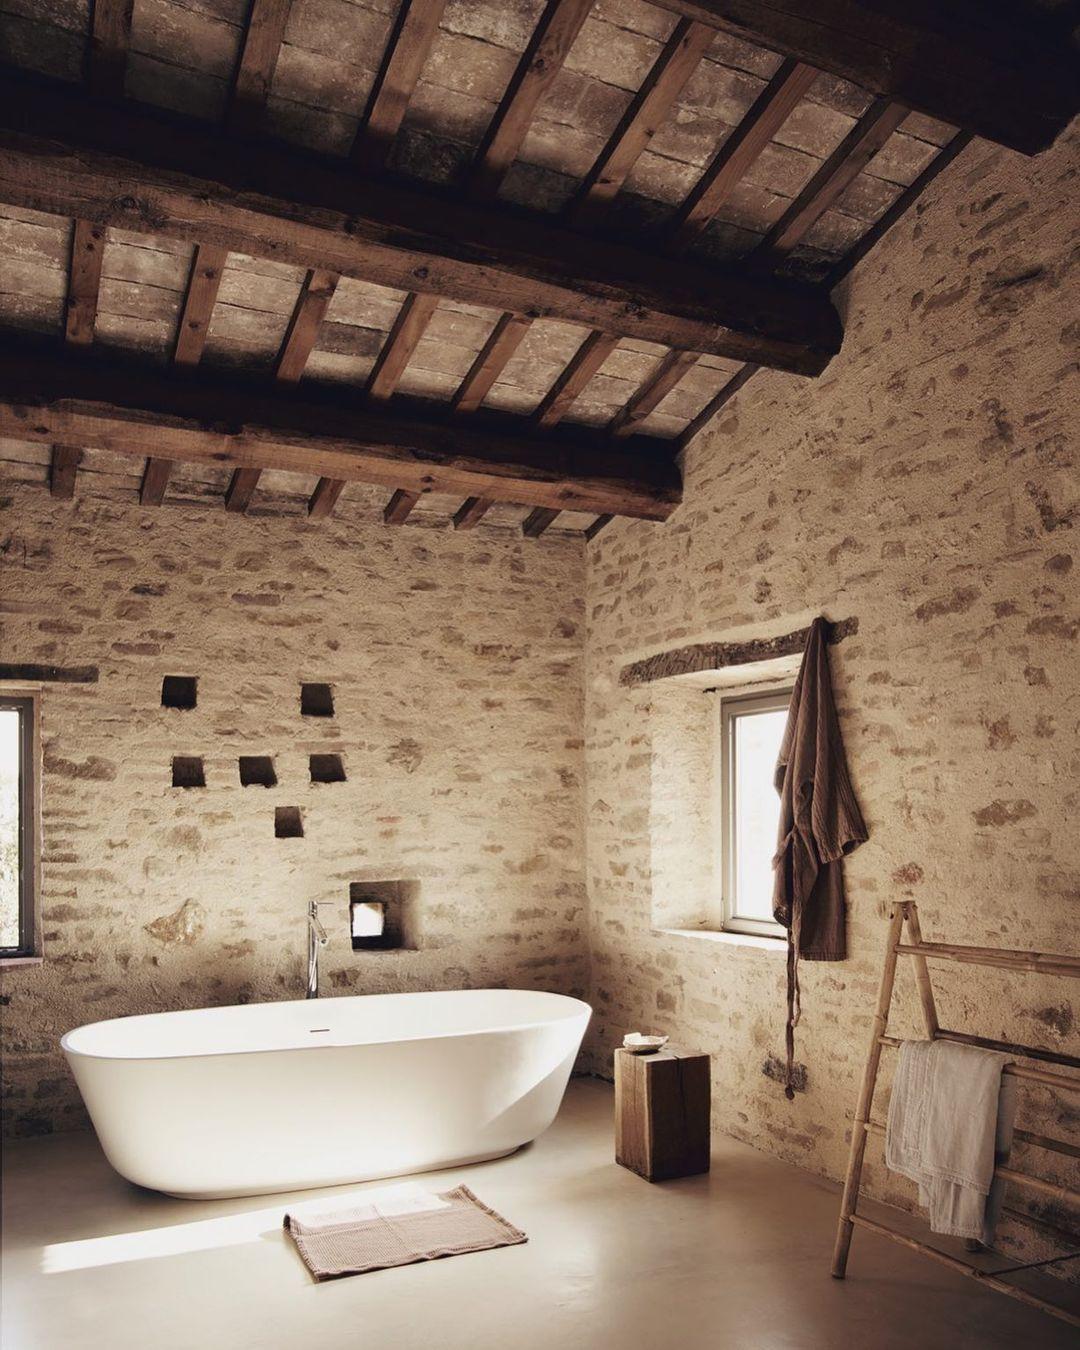 "Architecture Design on Instagram: ""CASA OLIVI I Wespi de Meuron I Marche, Italy 🇮🇹 I 📷 I @mikkeladsbol • • • • • • • • • #slowliving #fineinteriors #interior #interiordesign…"""